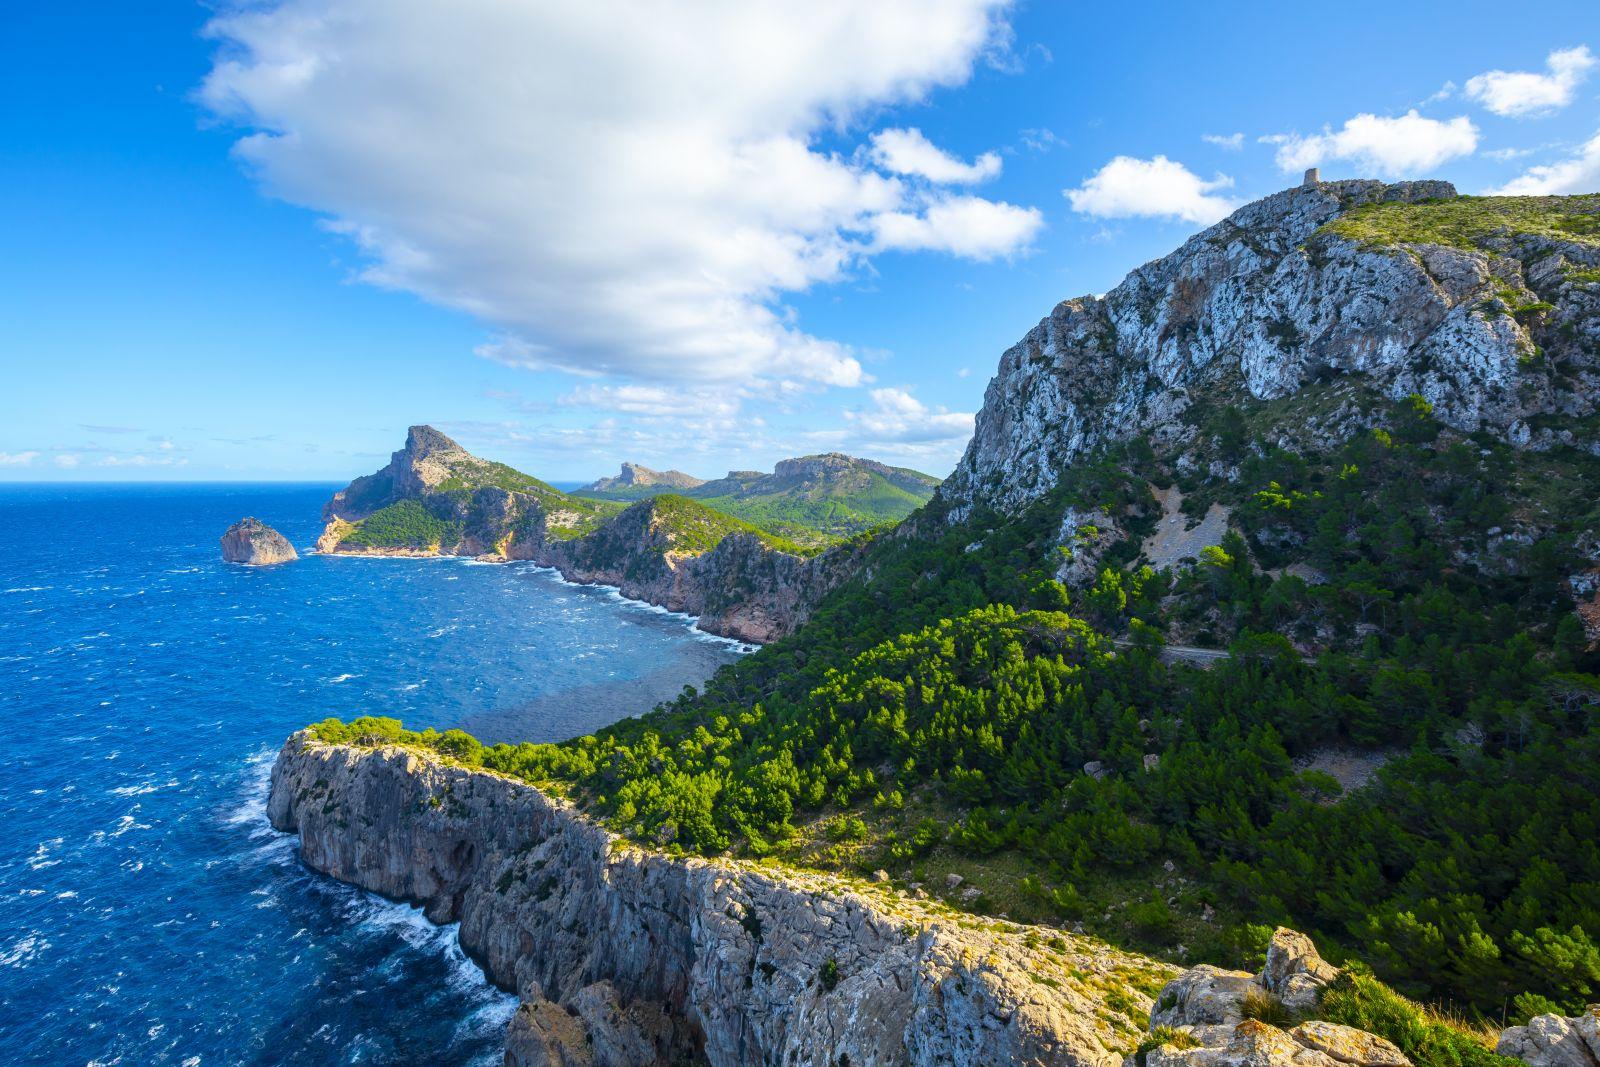 Im Norden kann man sich am Kap Formentor tolle Ausblicke verschaffen. ©Aleh Varanishcha/AdobeStock